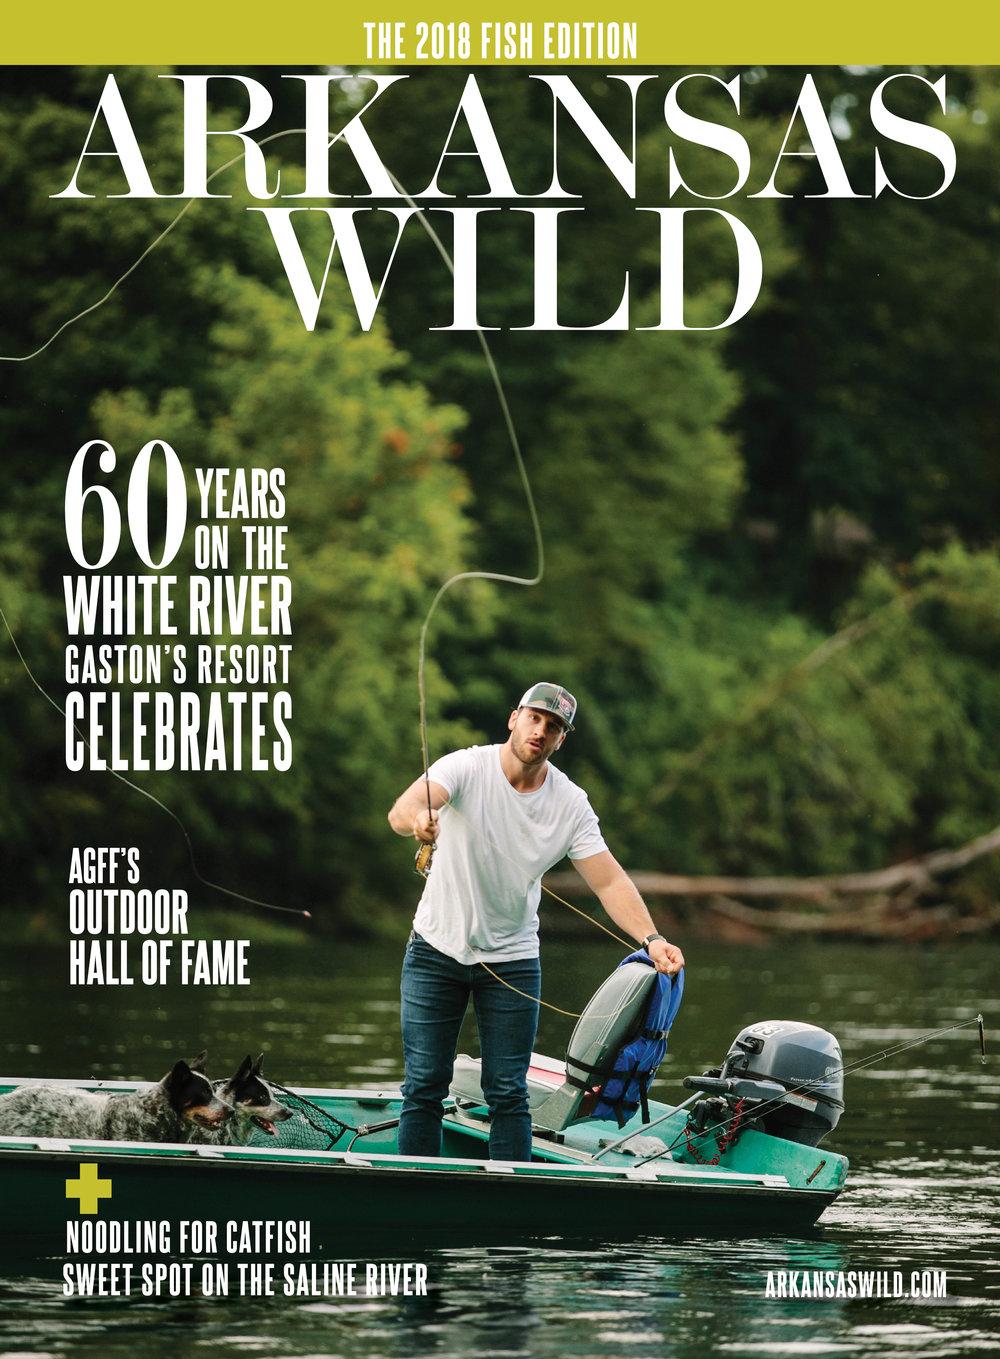 Fish Arkansas 2018 Edition cover.jpg